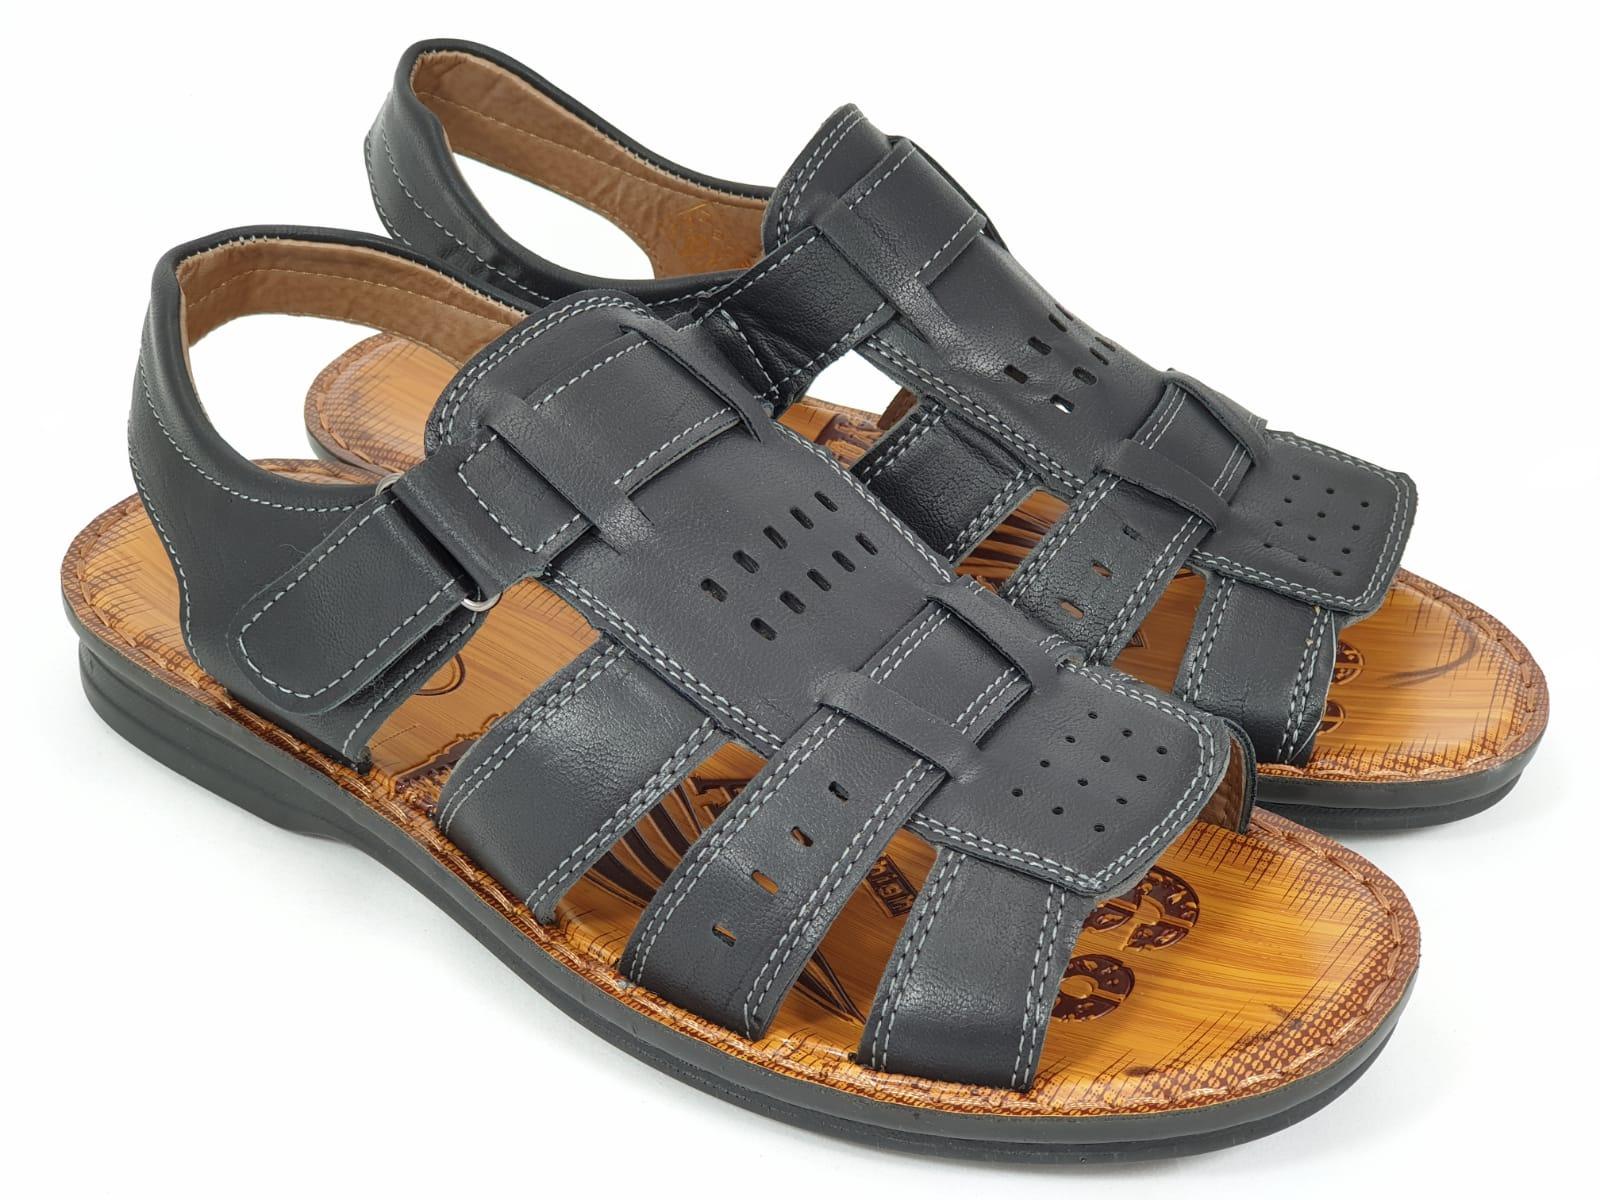 Sandale barbati negre Teodor